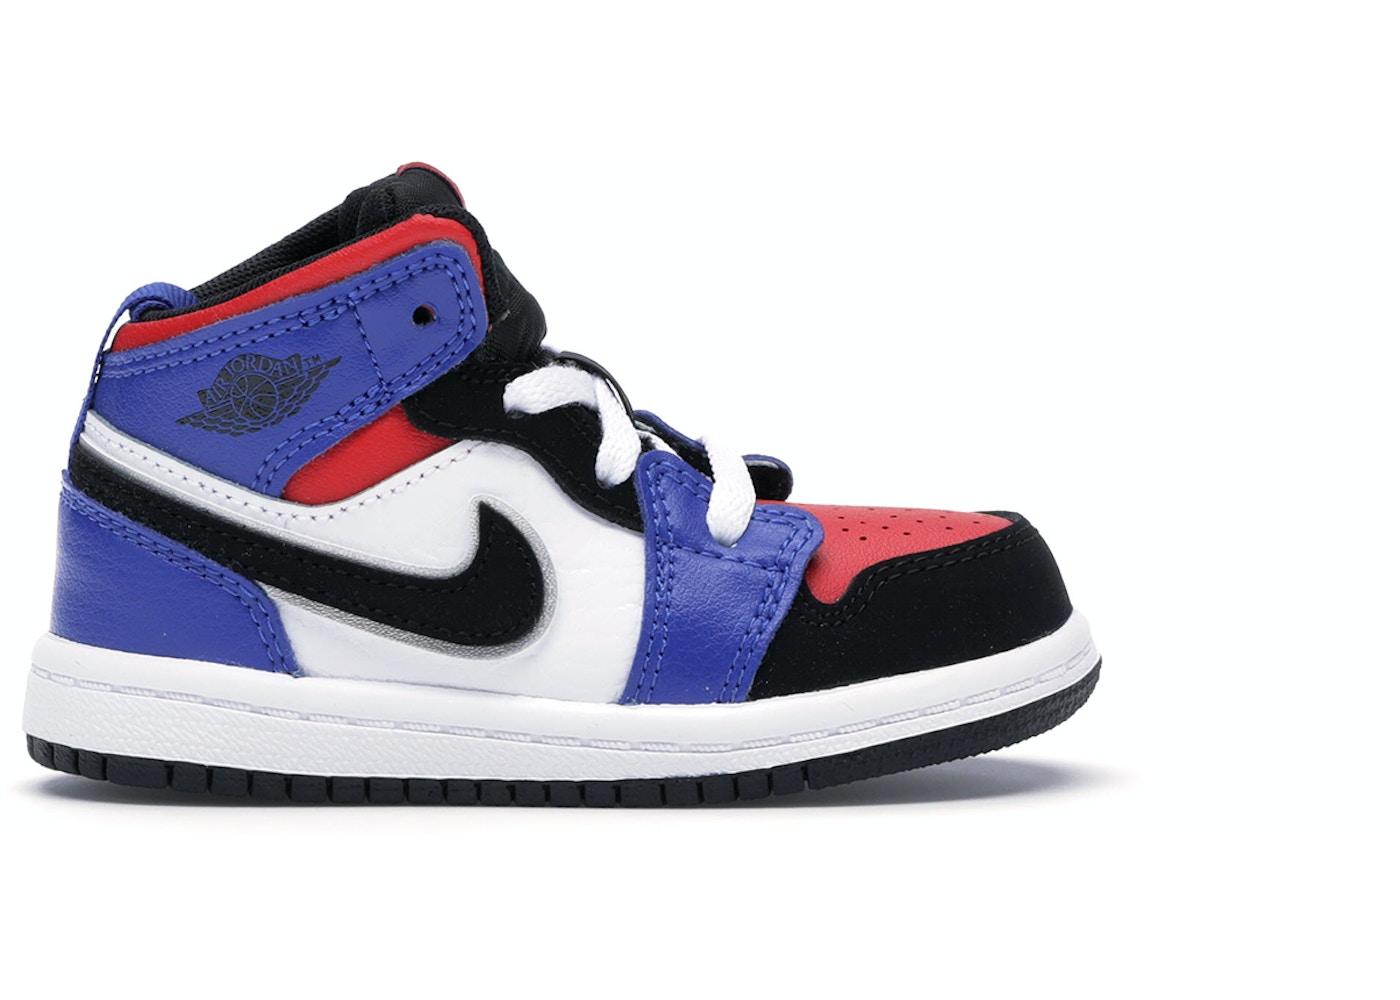 a115a5b68376 Buy Air Jordan 1 Size 6 Shoes   Deadstock Sneakers